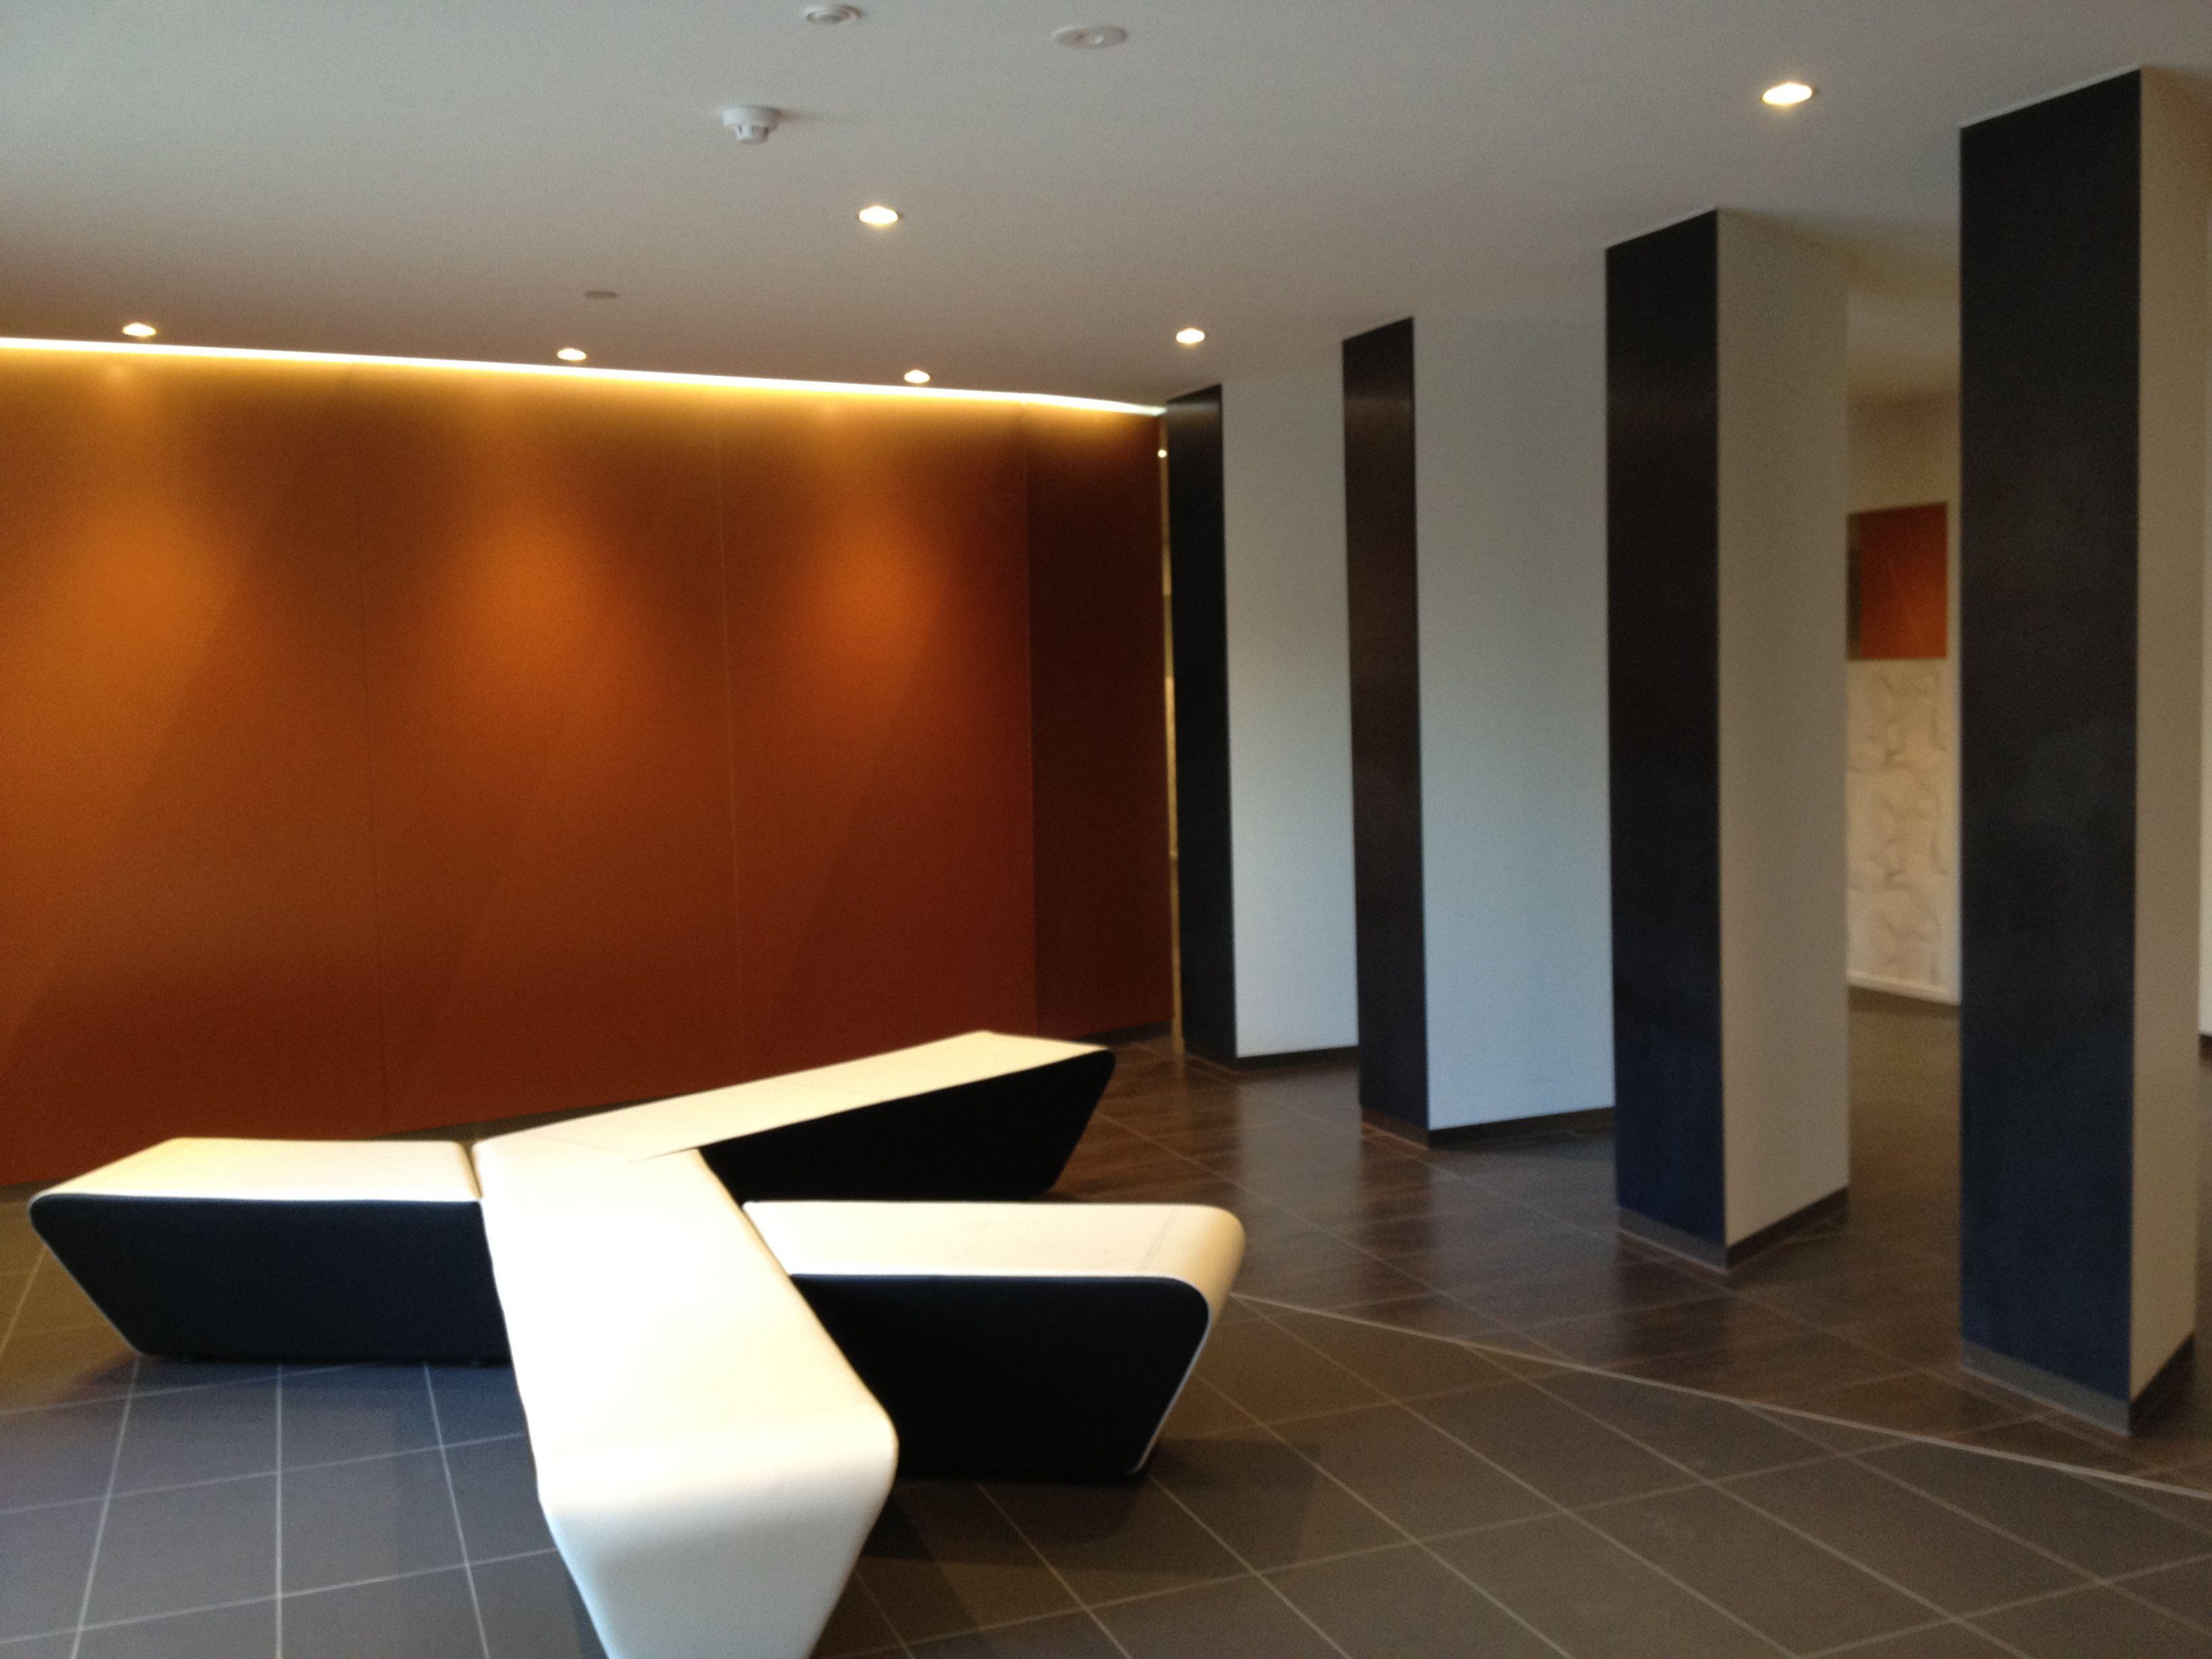 LIV apartment lobby BLP architects Apartment, Furniture